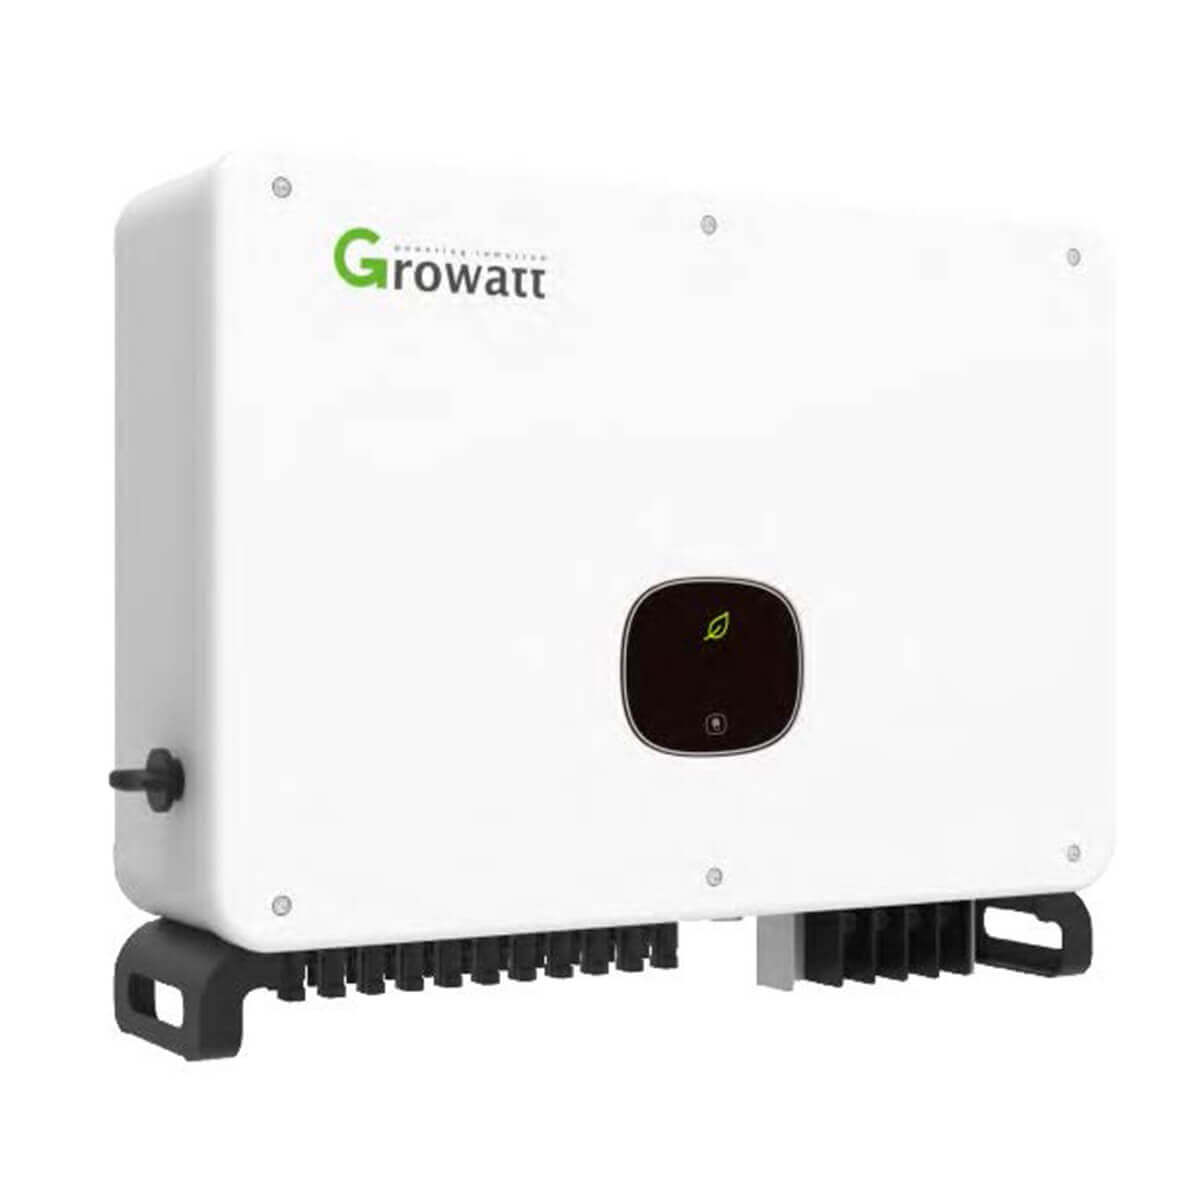 growatt 60kW inverter, growatt mac 60kW inverter, growatt mac 60ktl3-x lv-mv inverter, growatt mac 60ktl3-x lv-mv, growatt mac 60 kW